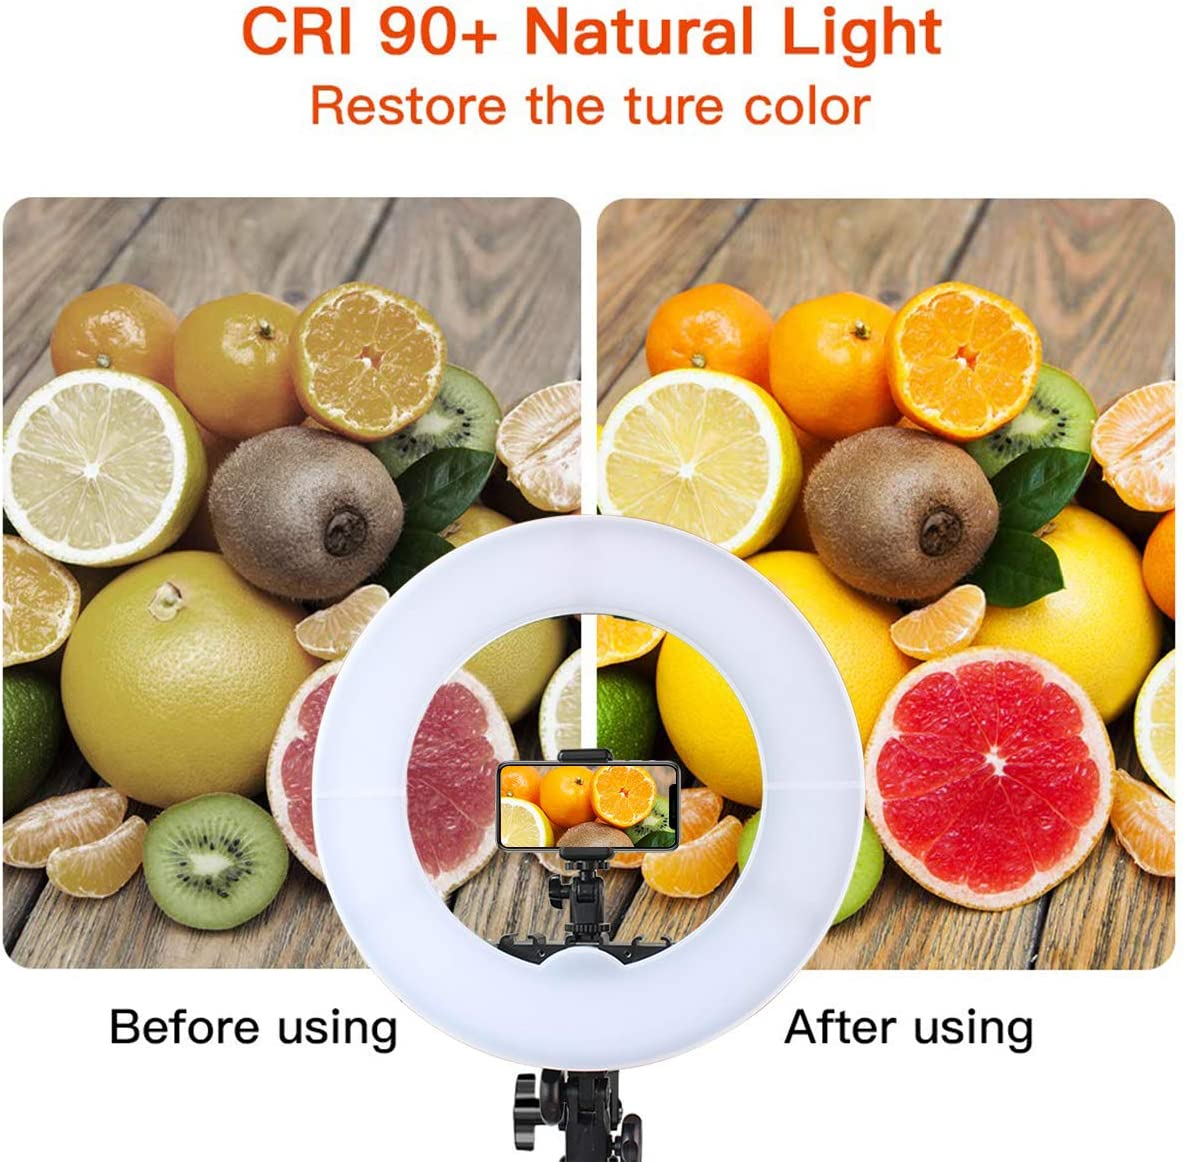 Qinhum Ring Light Dimmable LED Light Camera Phone Holder Stand Photo Video Studio Live Streaming Vlog Selfie Ship from US